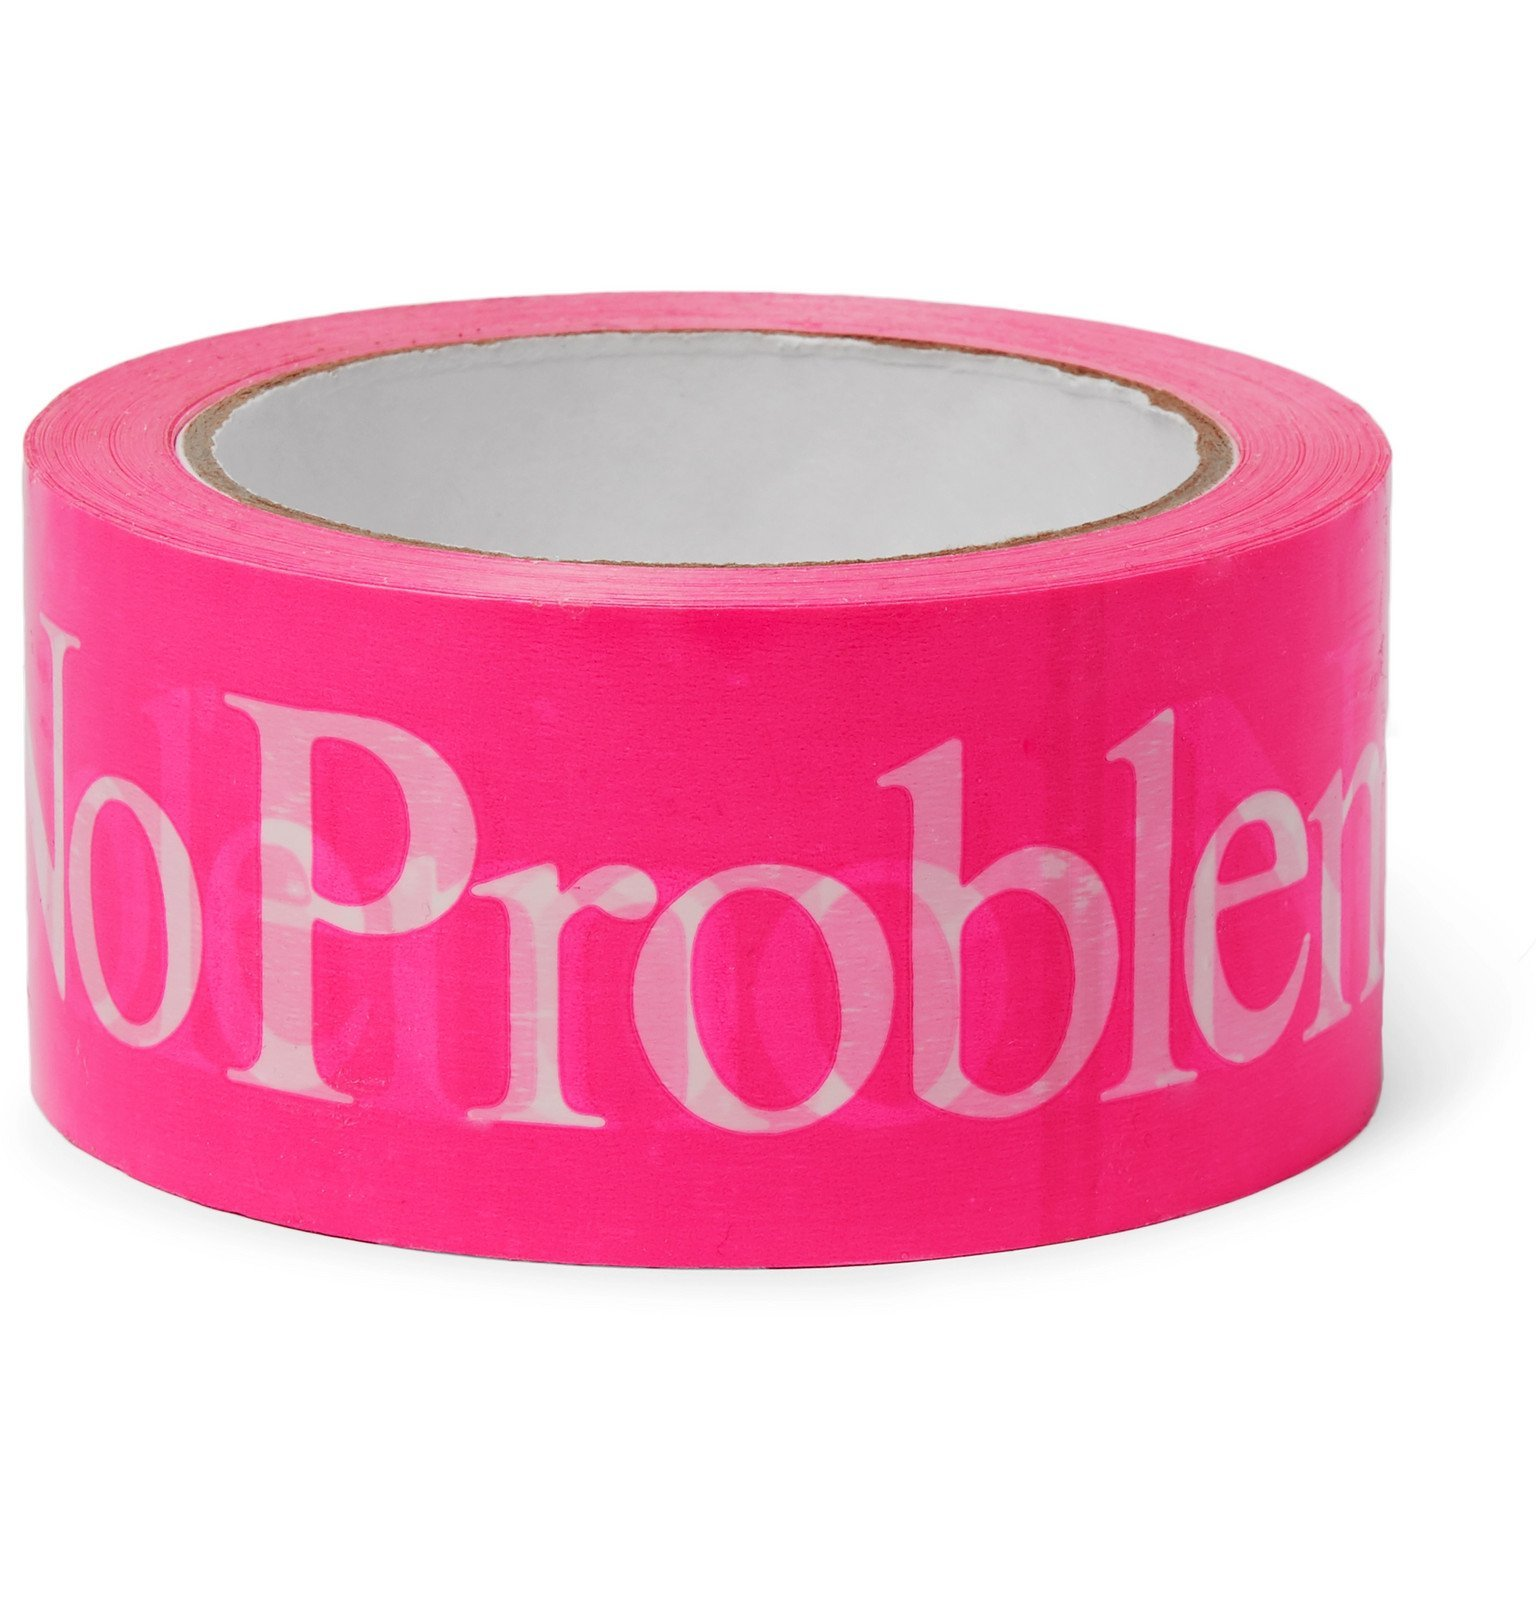 Aries - Logo-Print Vinyl Tape - Pink